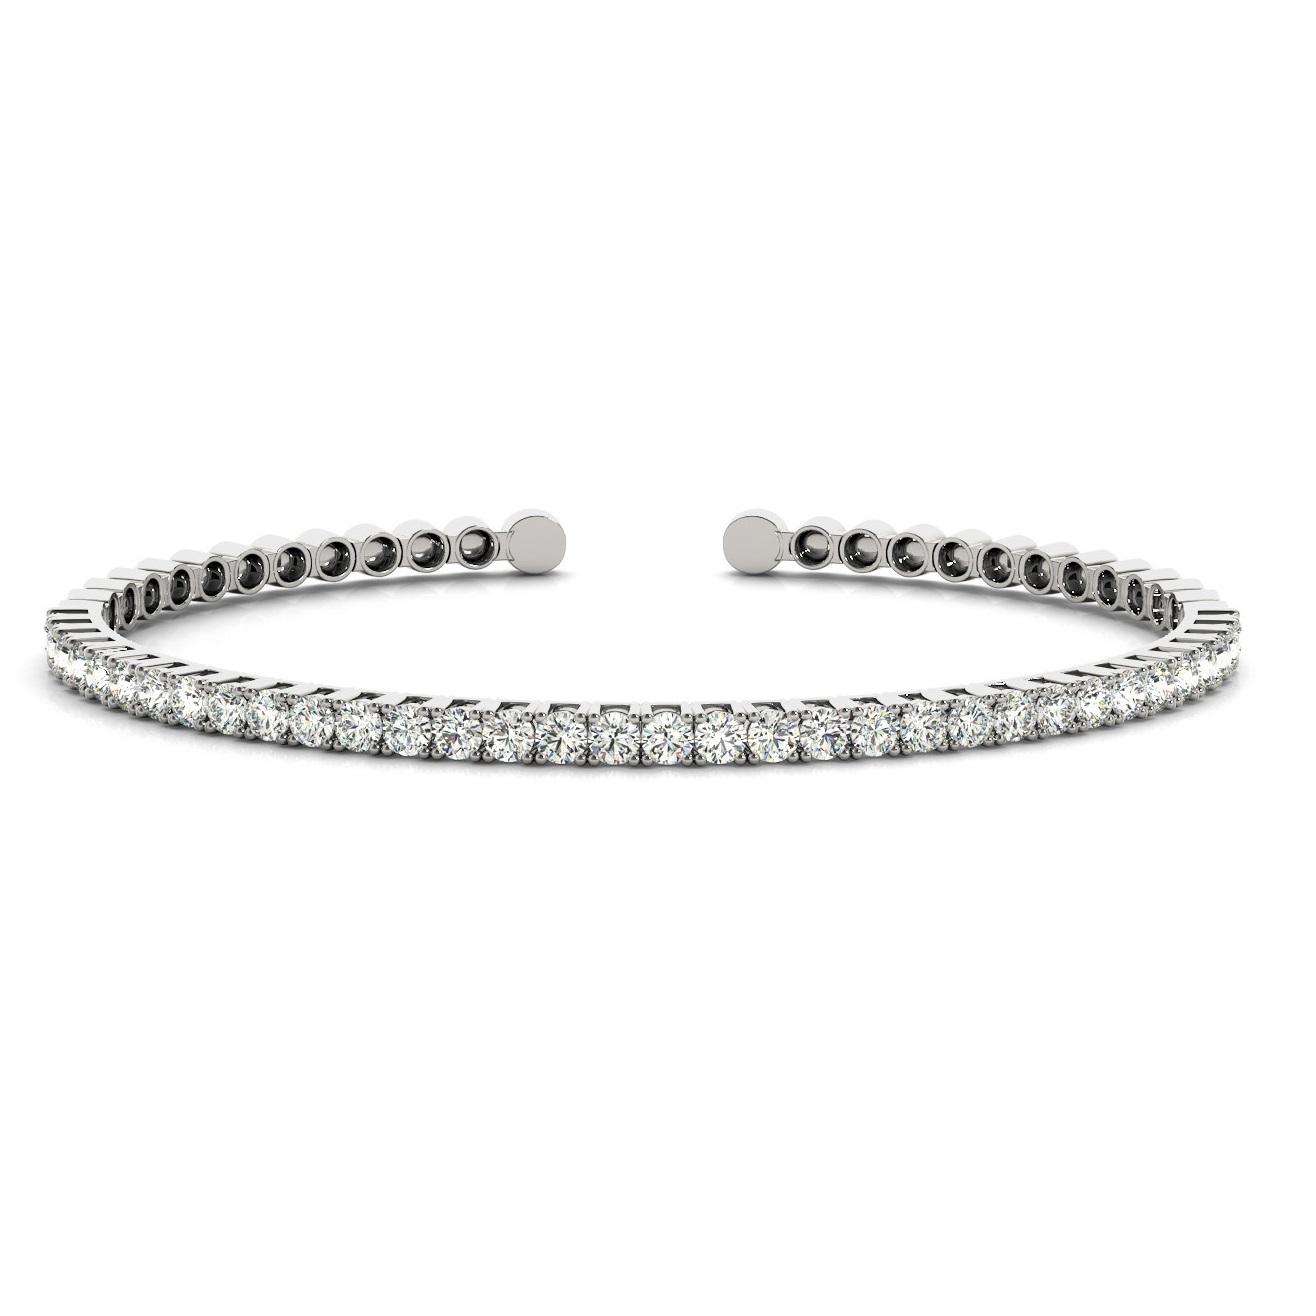 Diamond Open Cuff Bangle Tennis Bracelet 14k White Gold 1